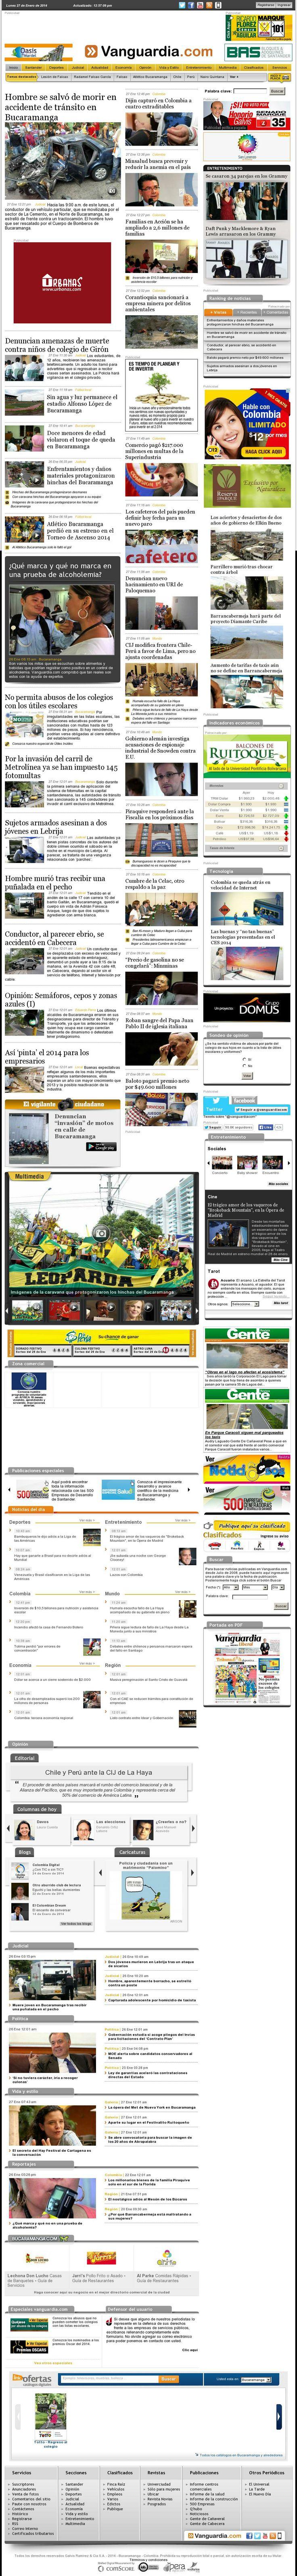 The website 'WWW.VANGUARDIA.COM' courtesy of @Pinstamatic (http://pinstamatic.com)